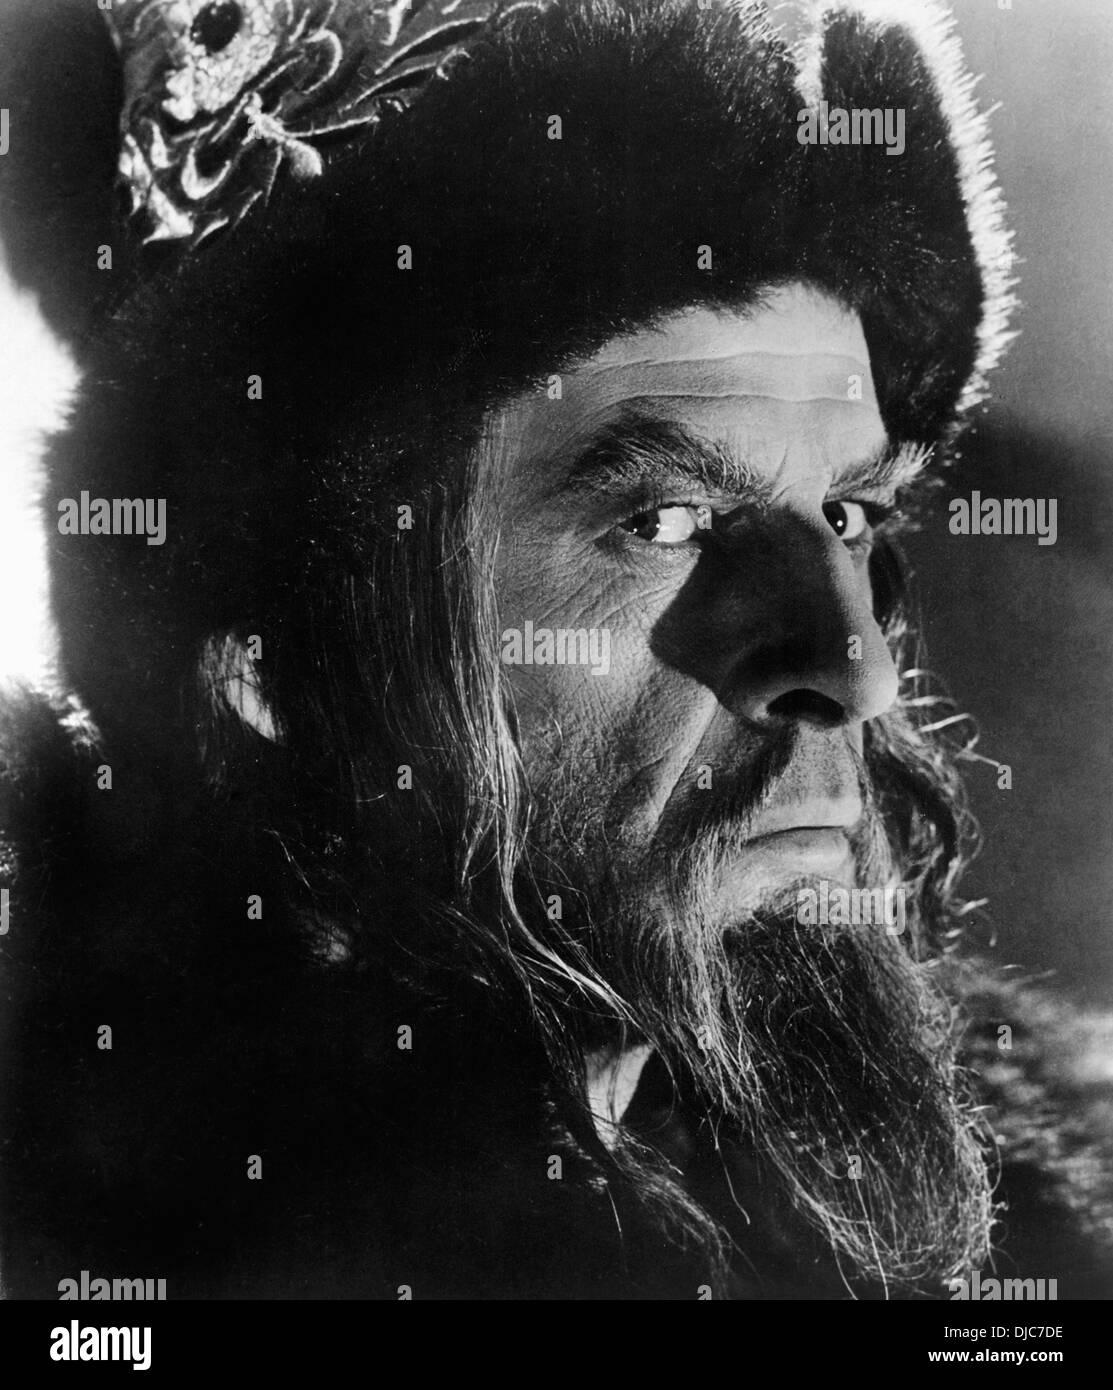 Nikolai Cherkassov on-set of the Film, Ivan the Terrible II (aka Ivan Groznyy II), 1945 - Stock Image